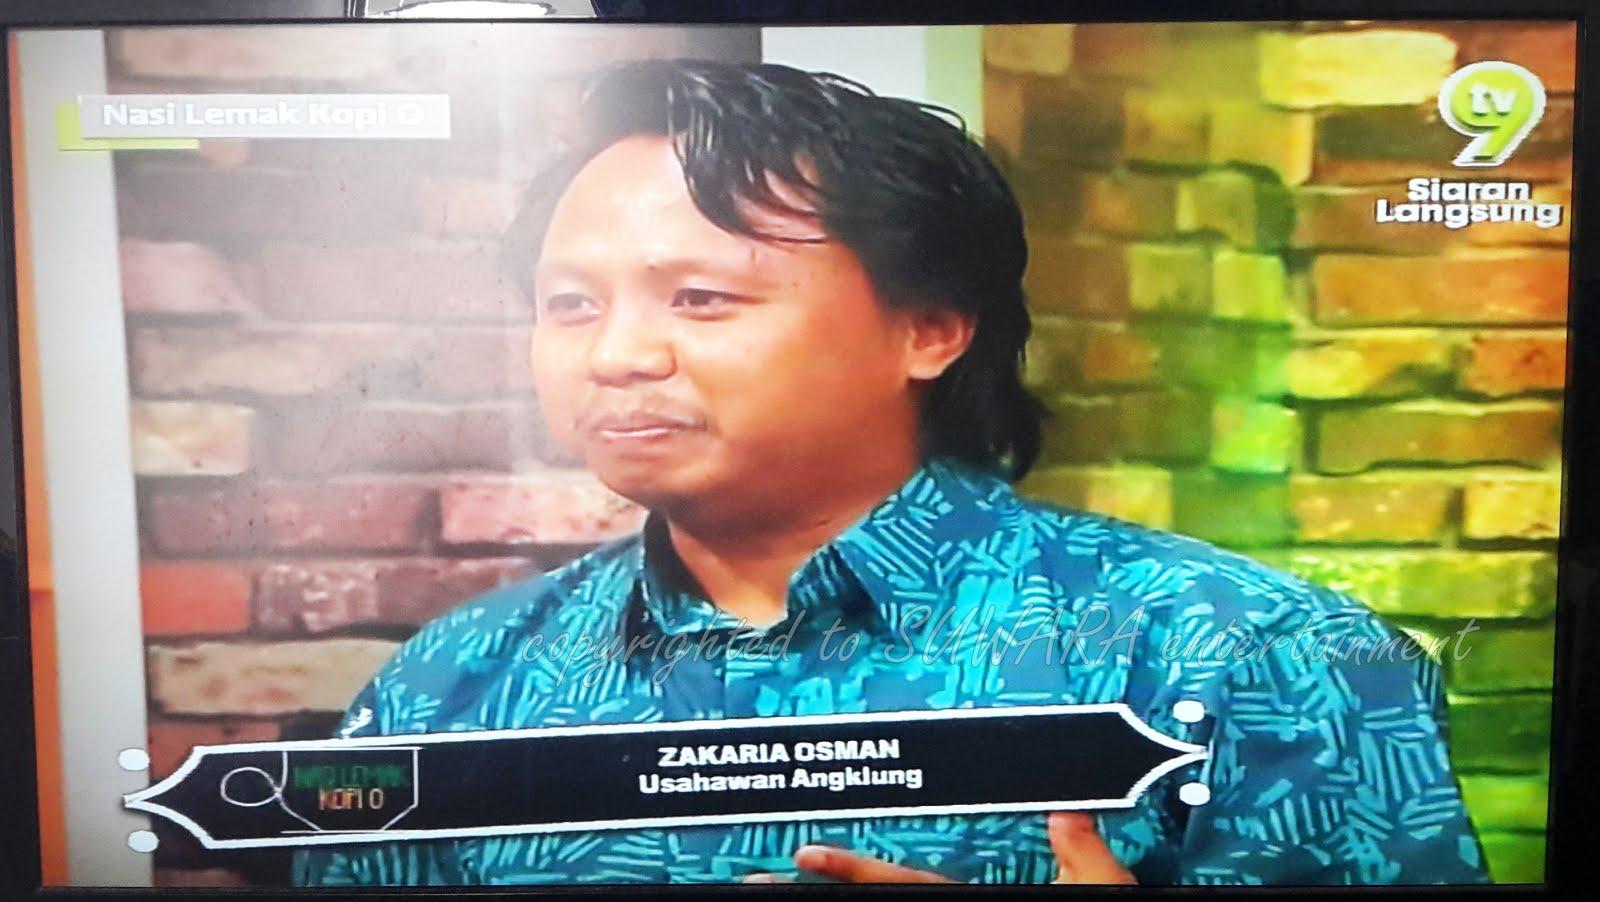 ZACK OSMAN LIVE @ NLKO, TV9